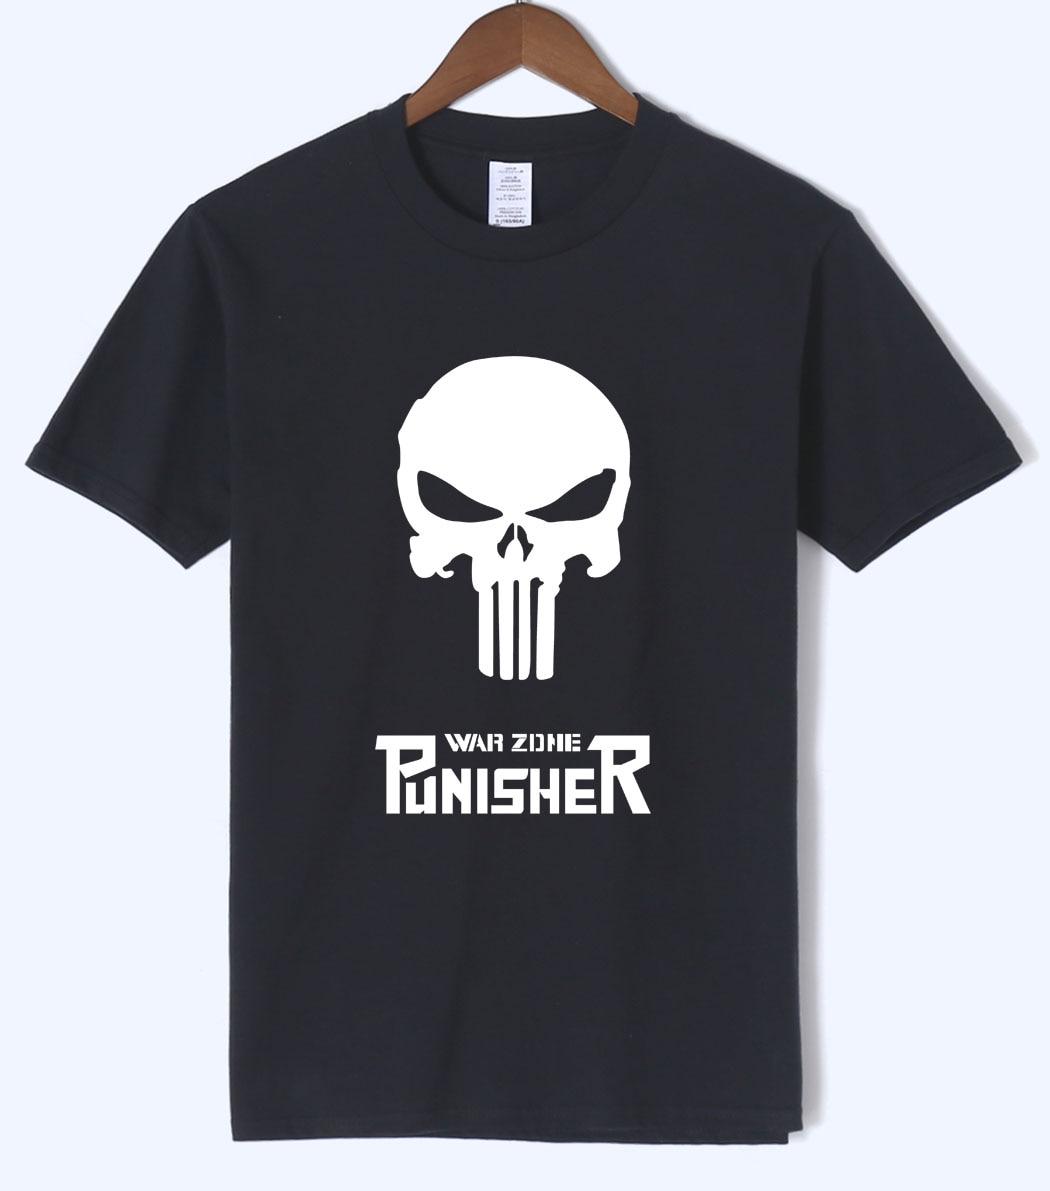 Superman Punisher Skull Hip Hop Men T Shirt 2018 Summer New Arrival Funny Mens T Shirts 100% Cotton Short Sleeve O-neck T-Shirts